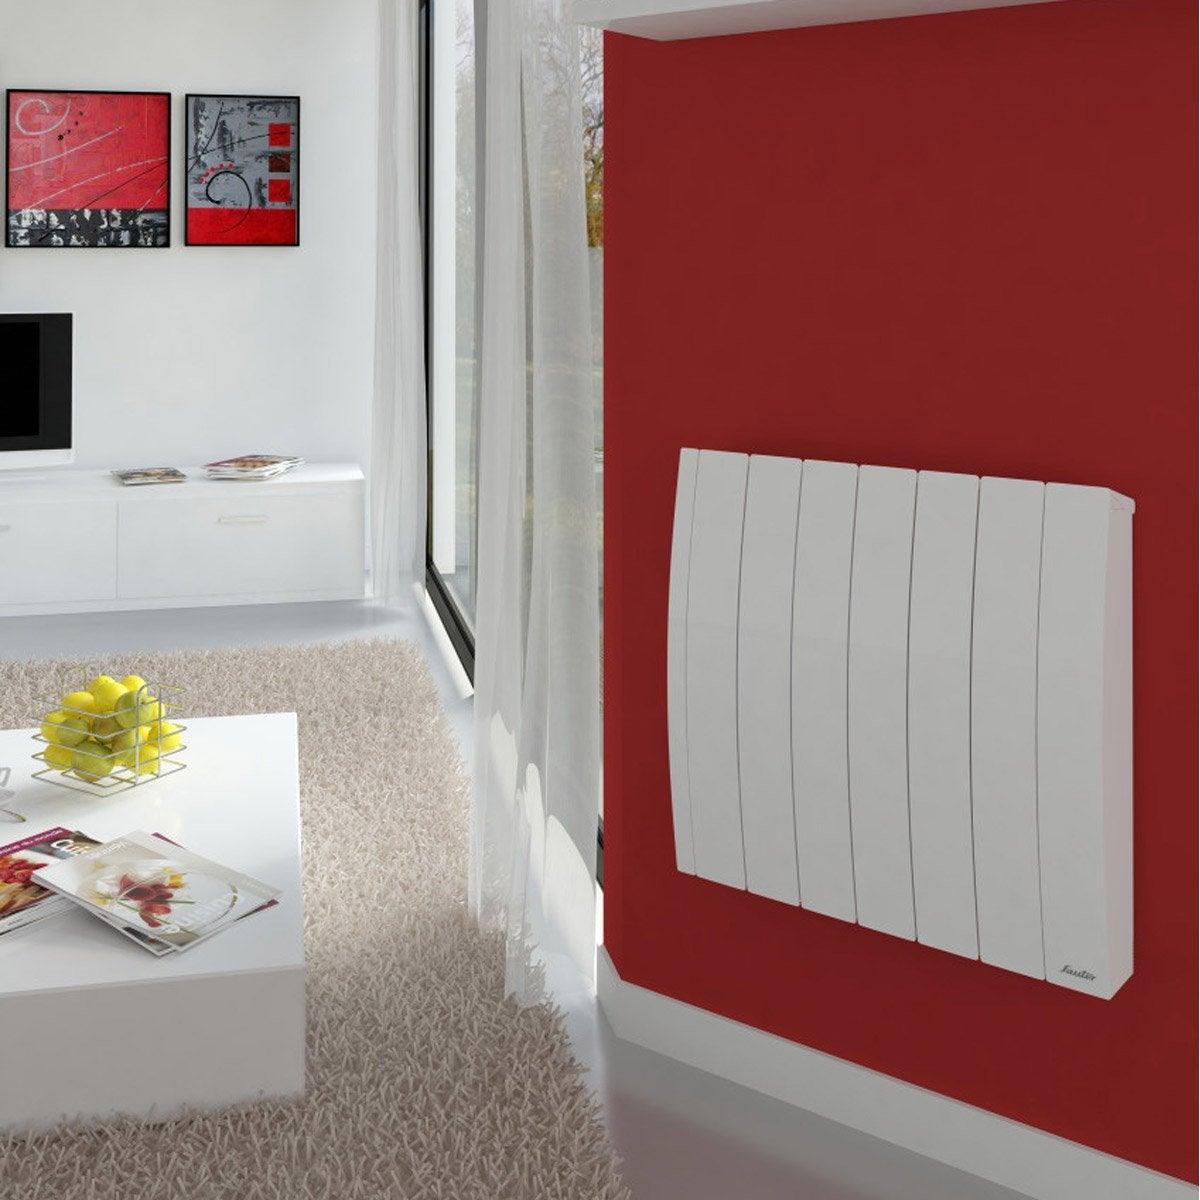 solde radiateur inertie cheap radiateur electrique mobile. Black Bedroom Furniture Sets. Home Design Ideas